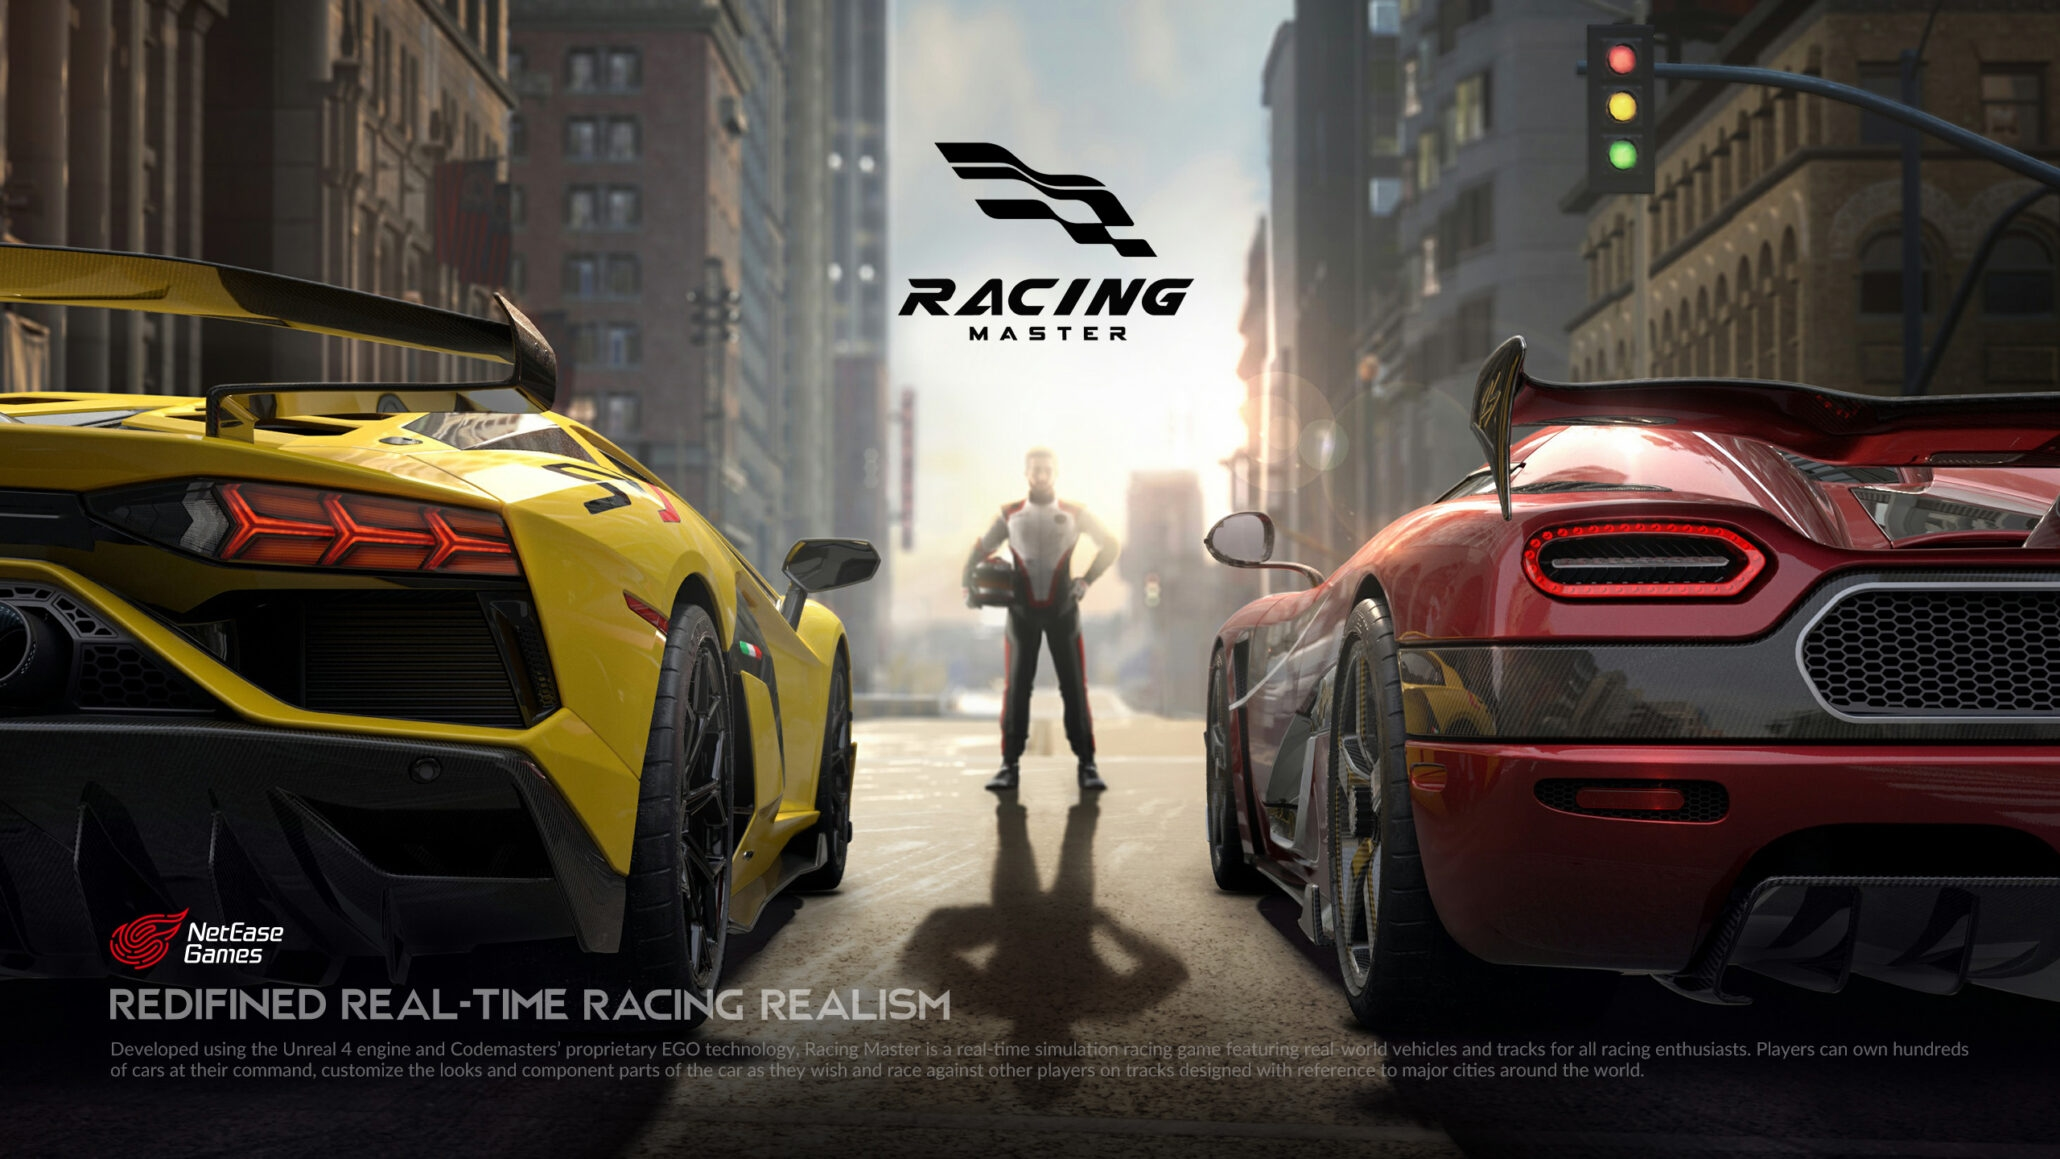 Racing Master codemasters